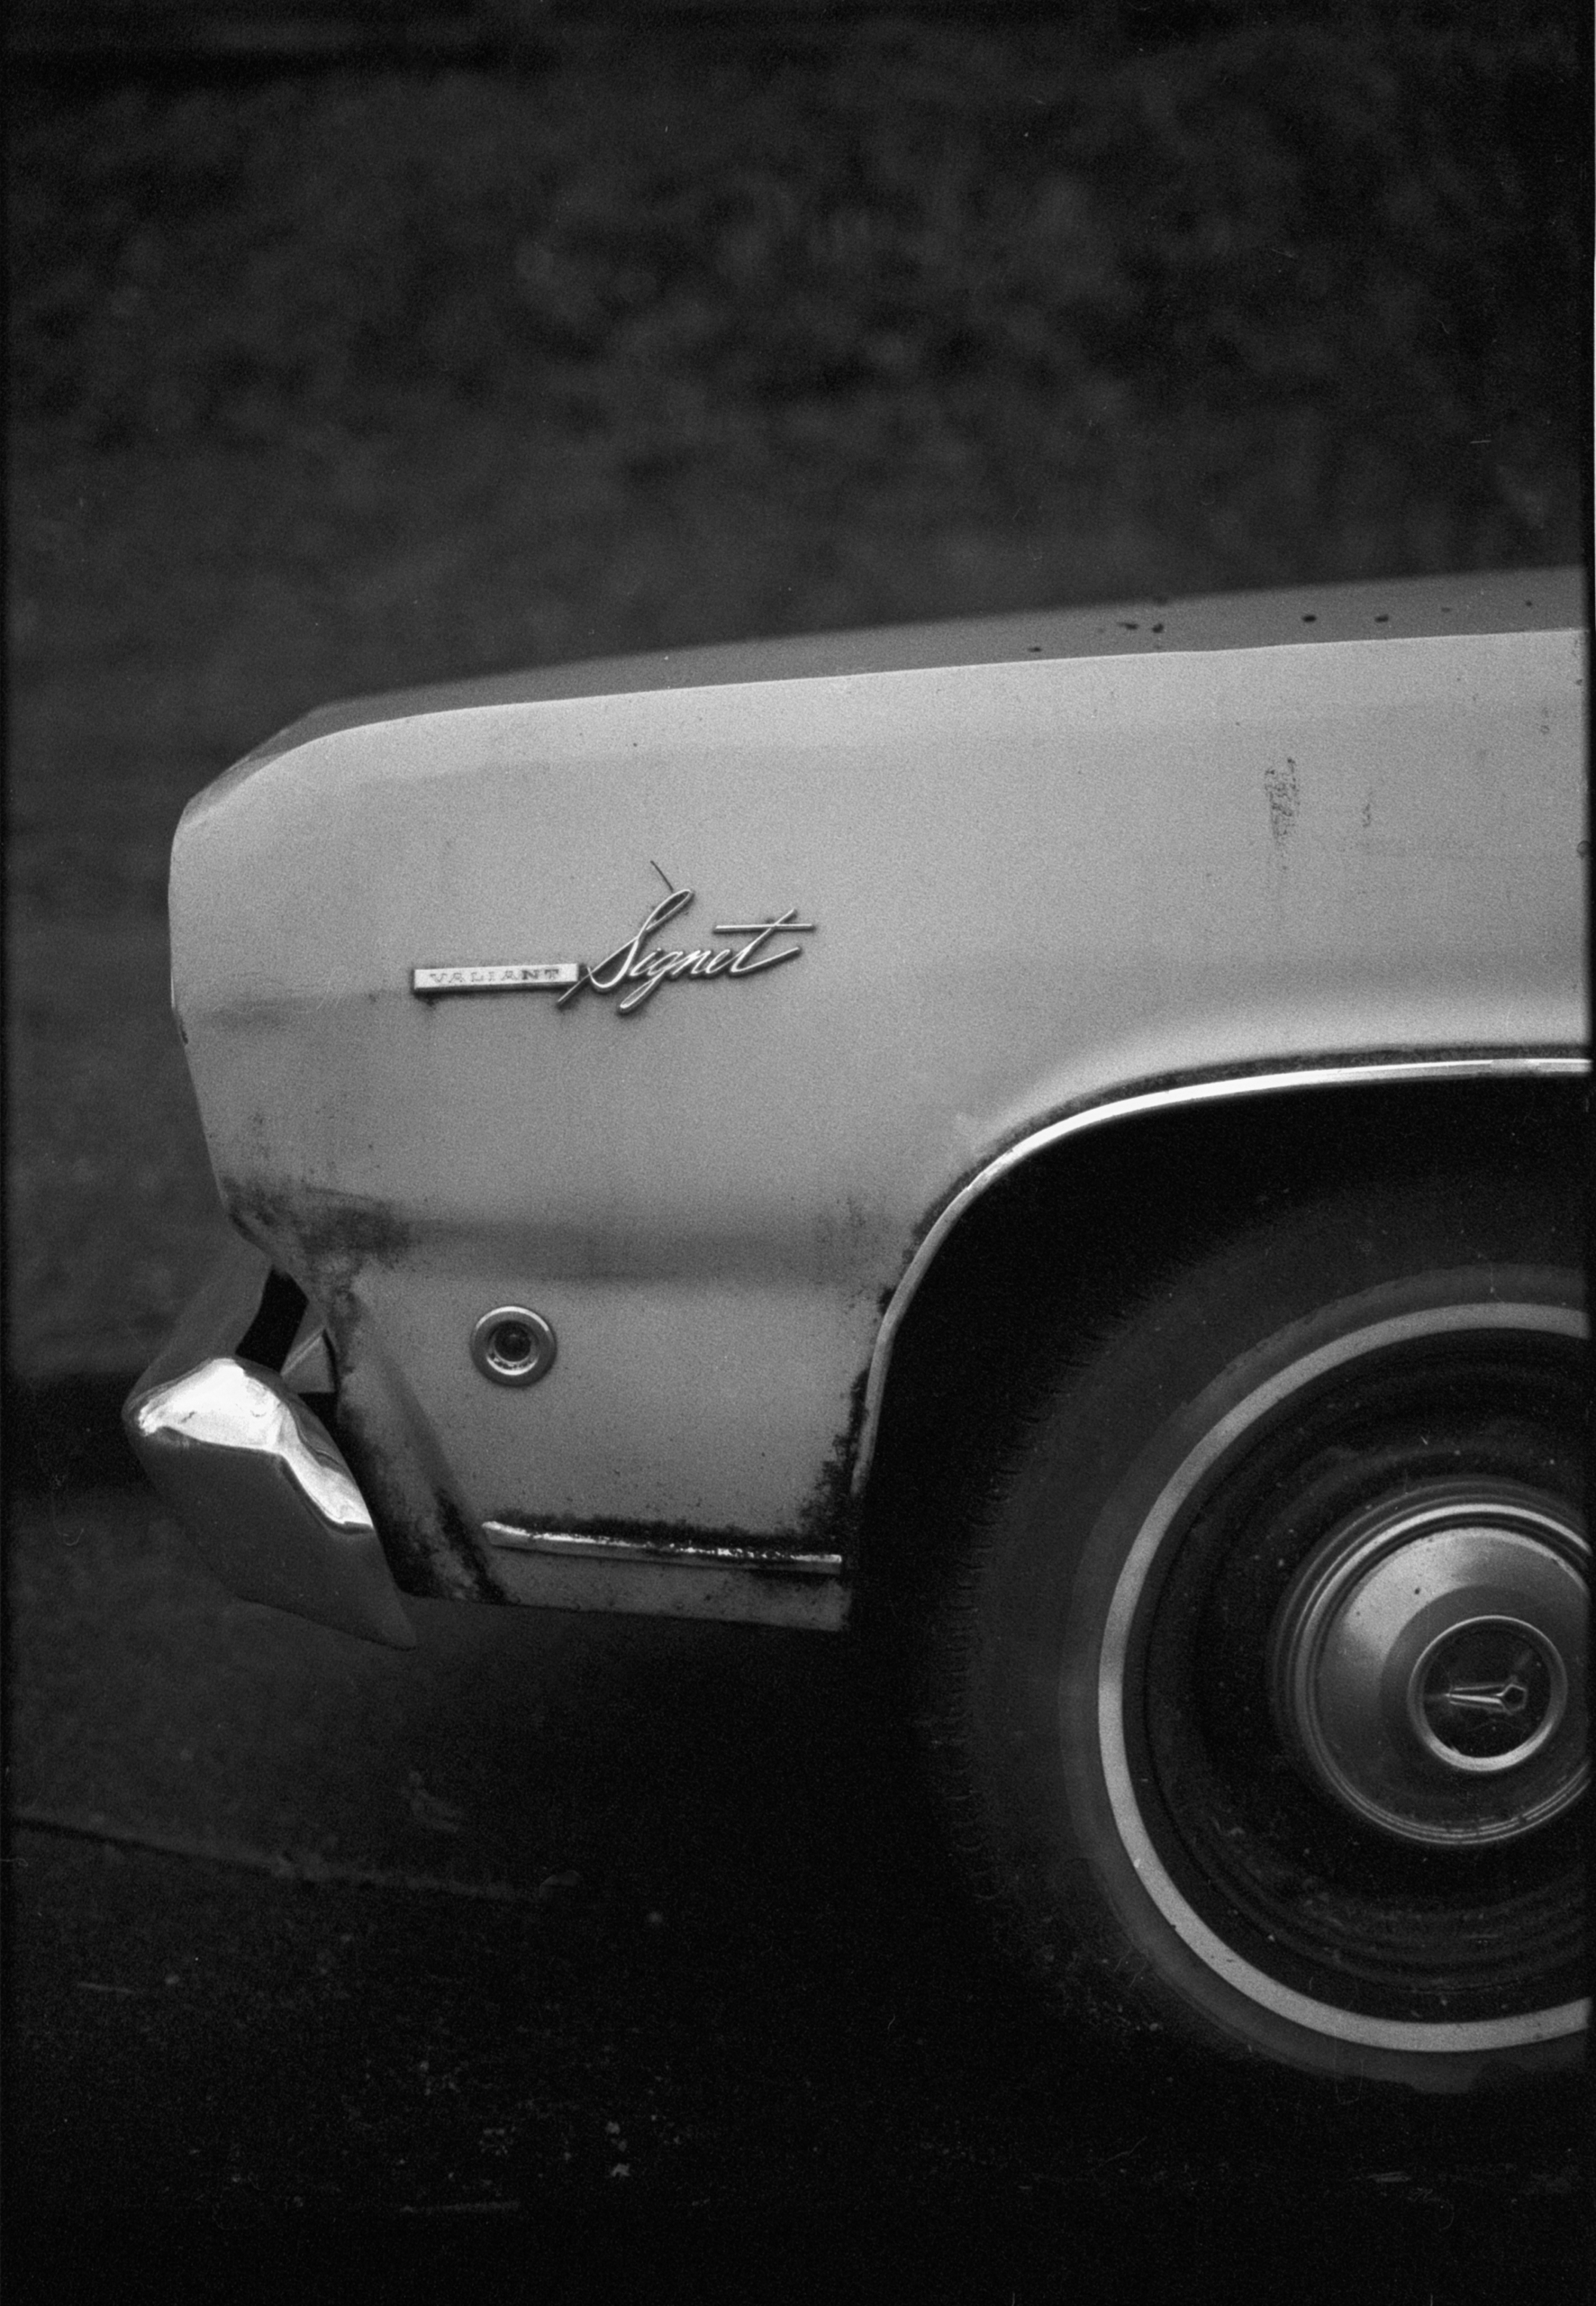 Plymouth Valiant Signet. Plenty - kch | ello